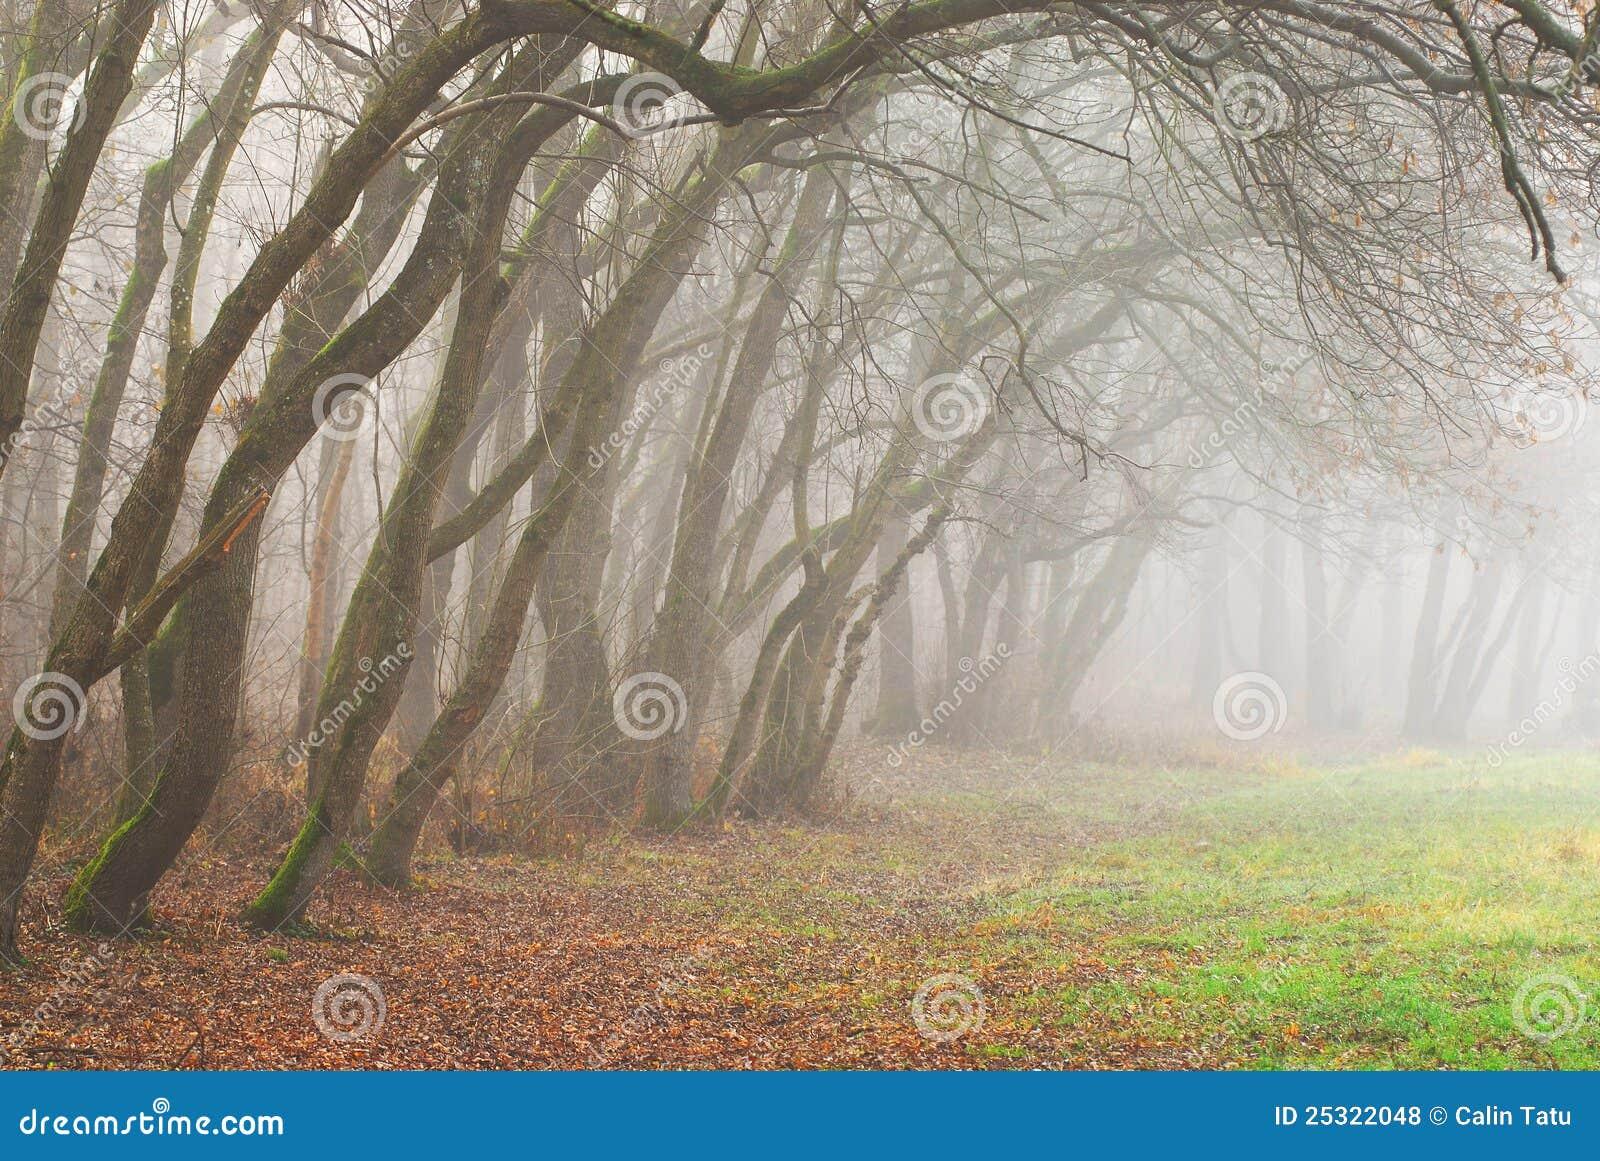 Autumn scenery in the forest with morning fog stock photo for Disegni di paesaggi colorati